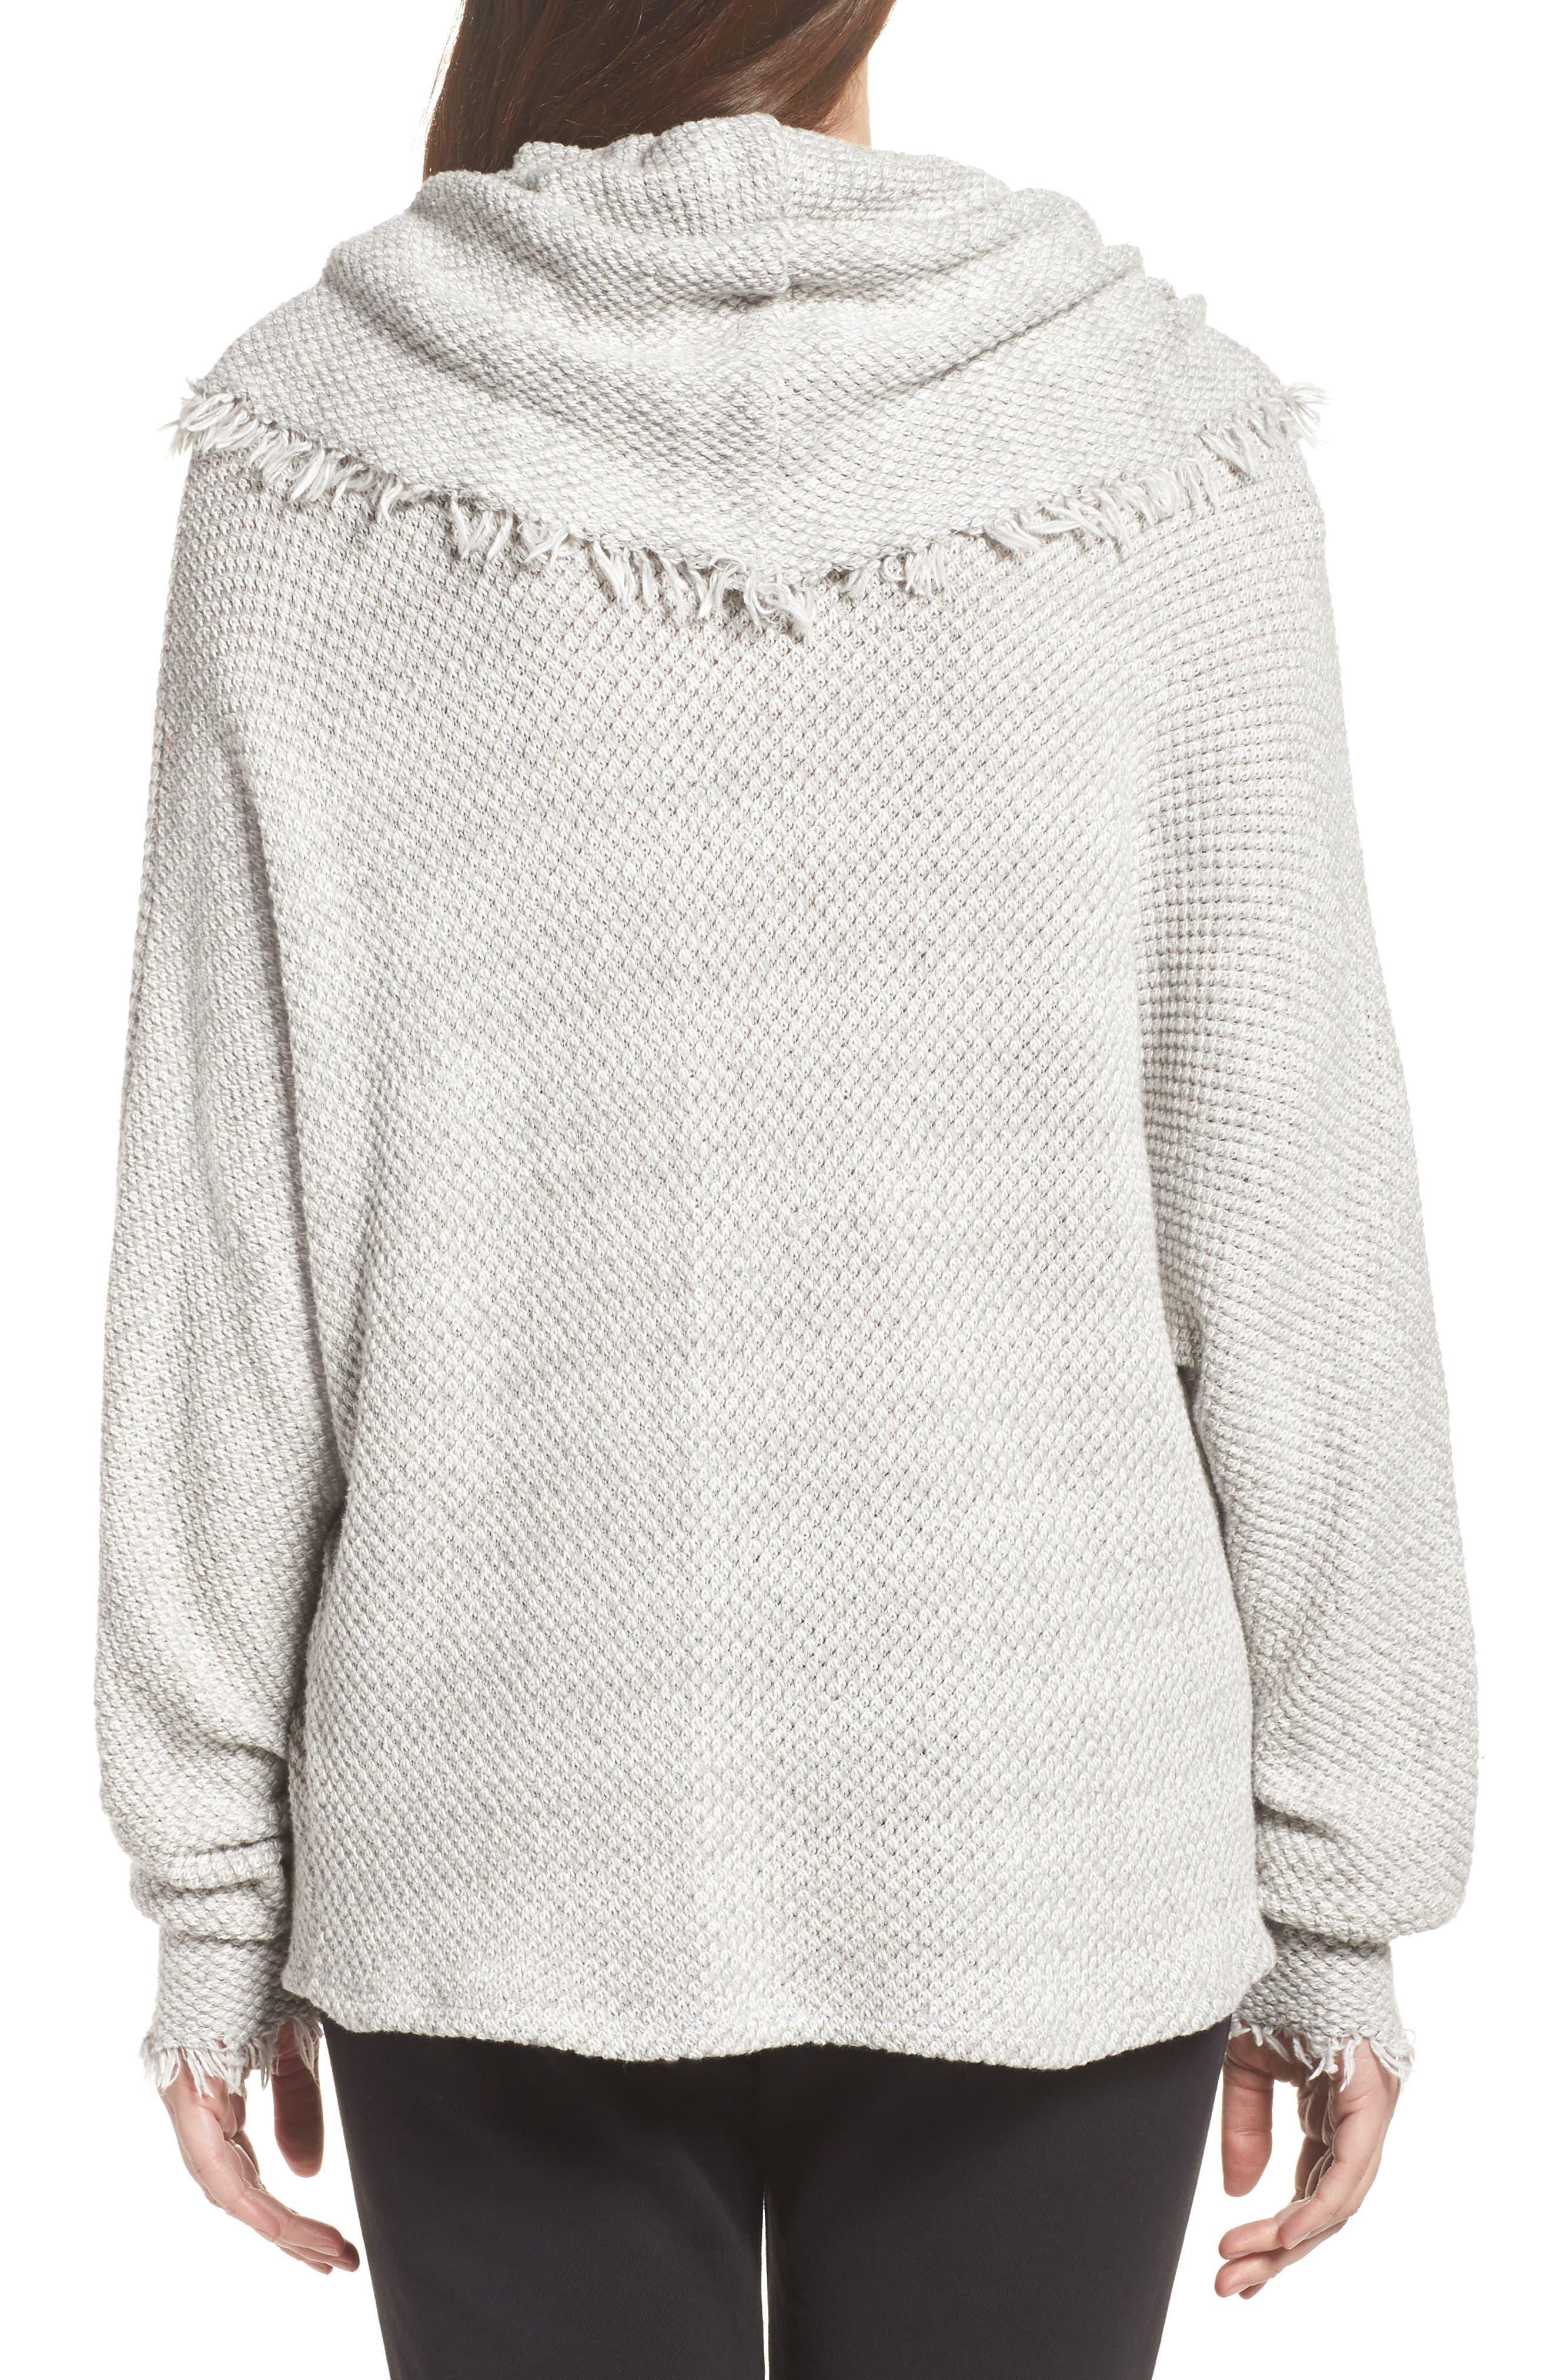 Oversize Turtleneck Sweater,                             Alternate thumbnail 2, color,                             Heather Grey